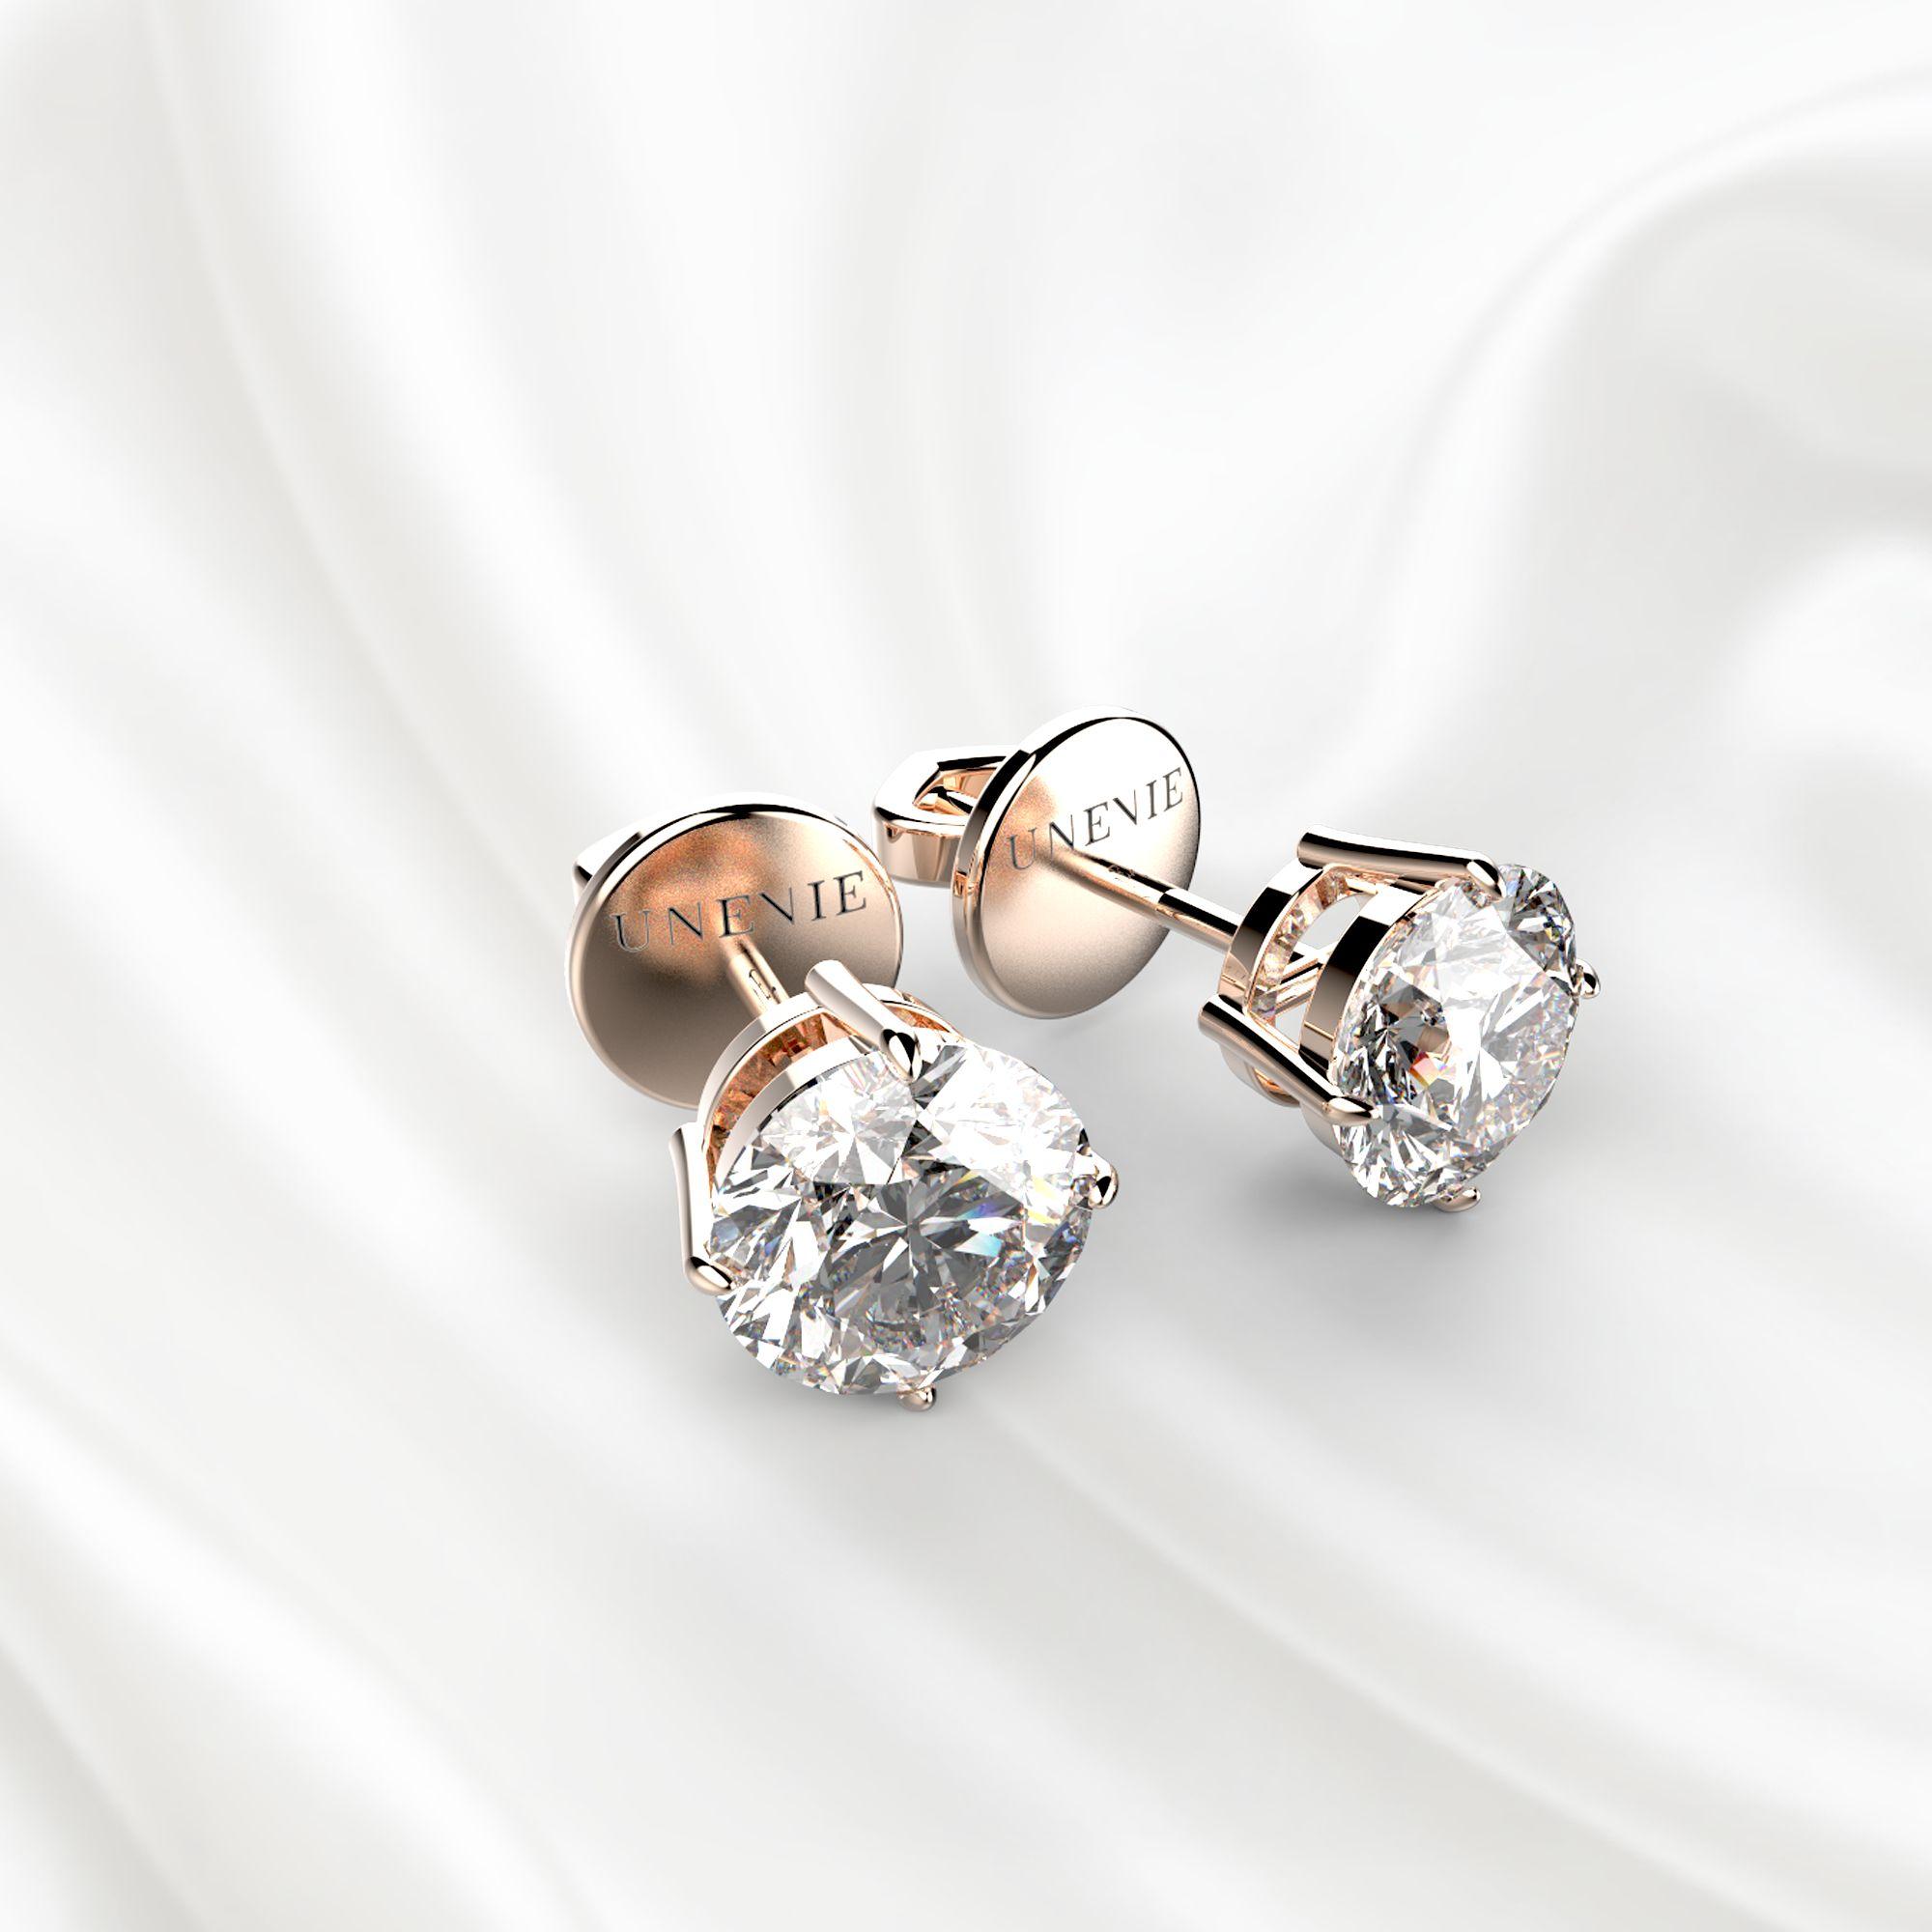 S3 Серьги из розового золота с бриллиантами 0,8 карат